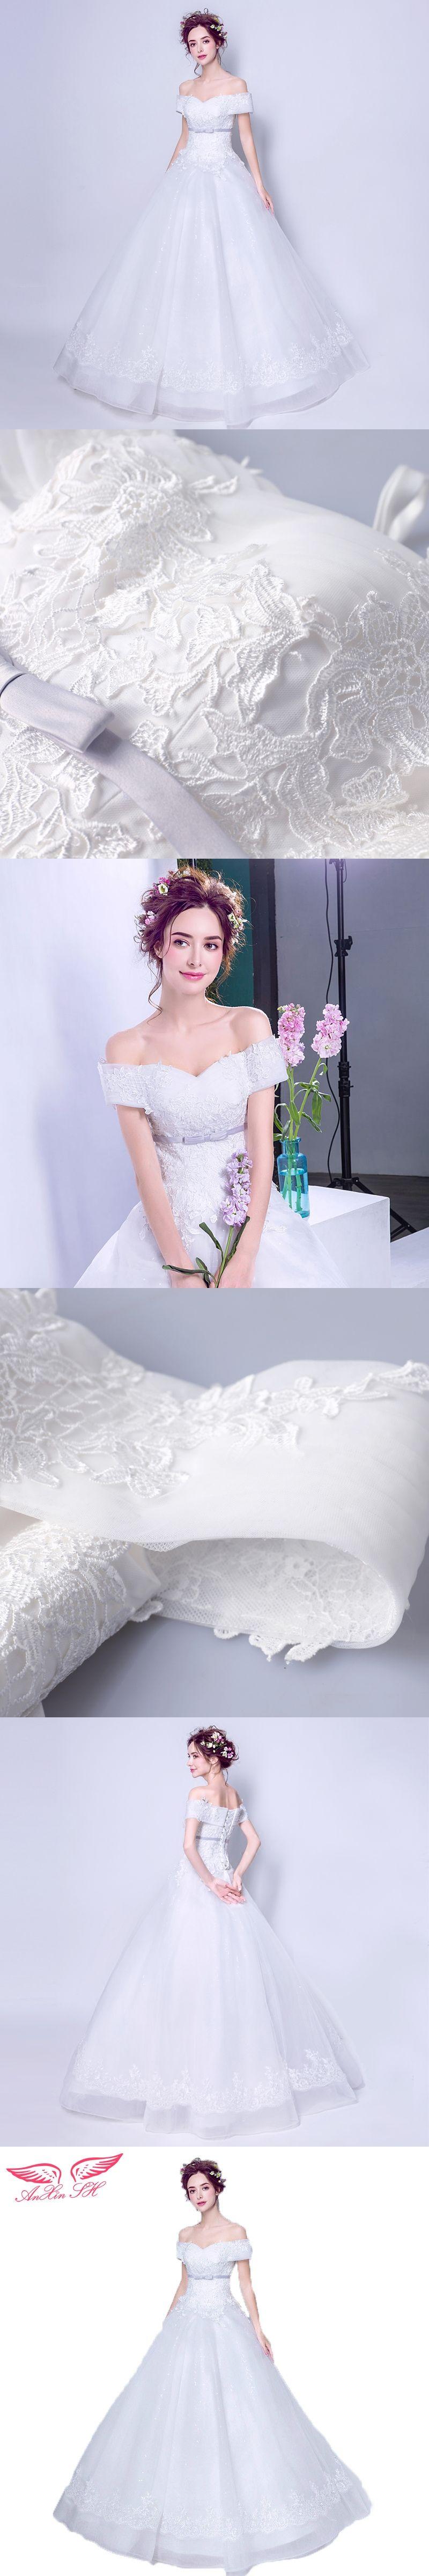 Wedding dresses for thin figures AnXin SH Charming figure Strapless thin tall princess bride wedding